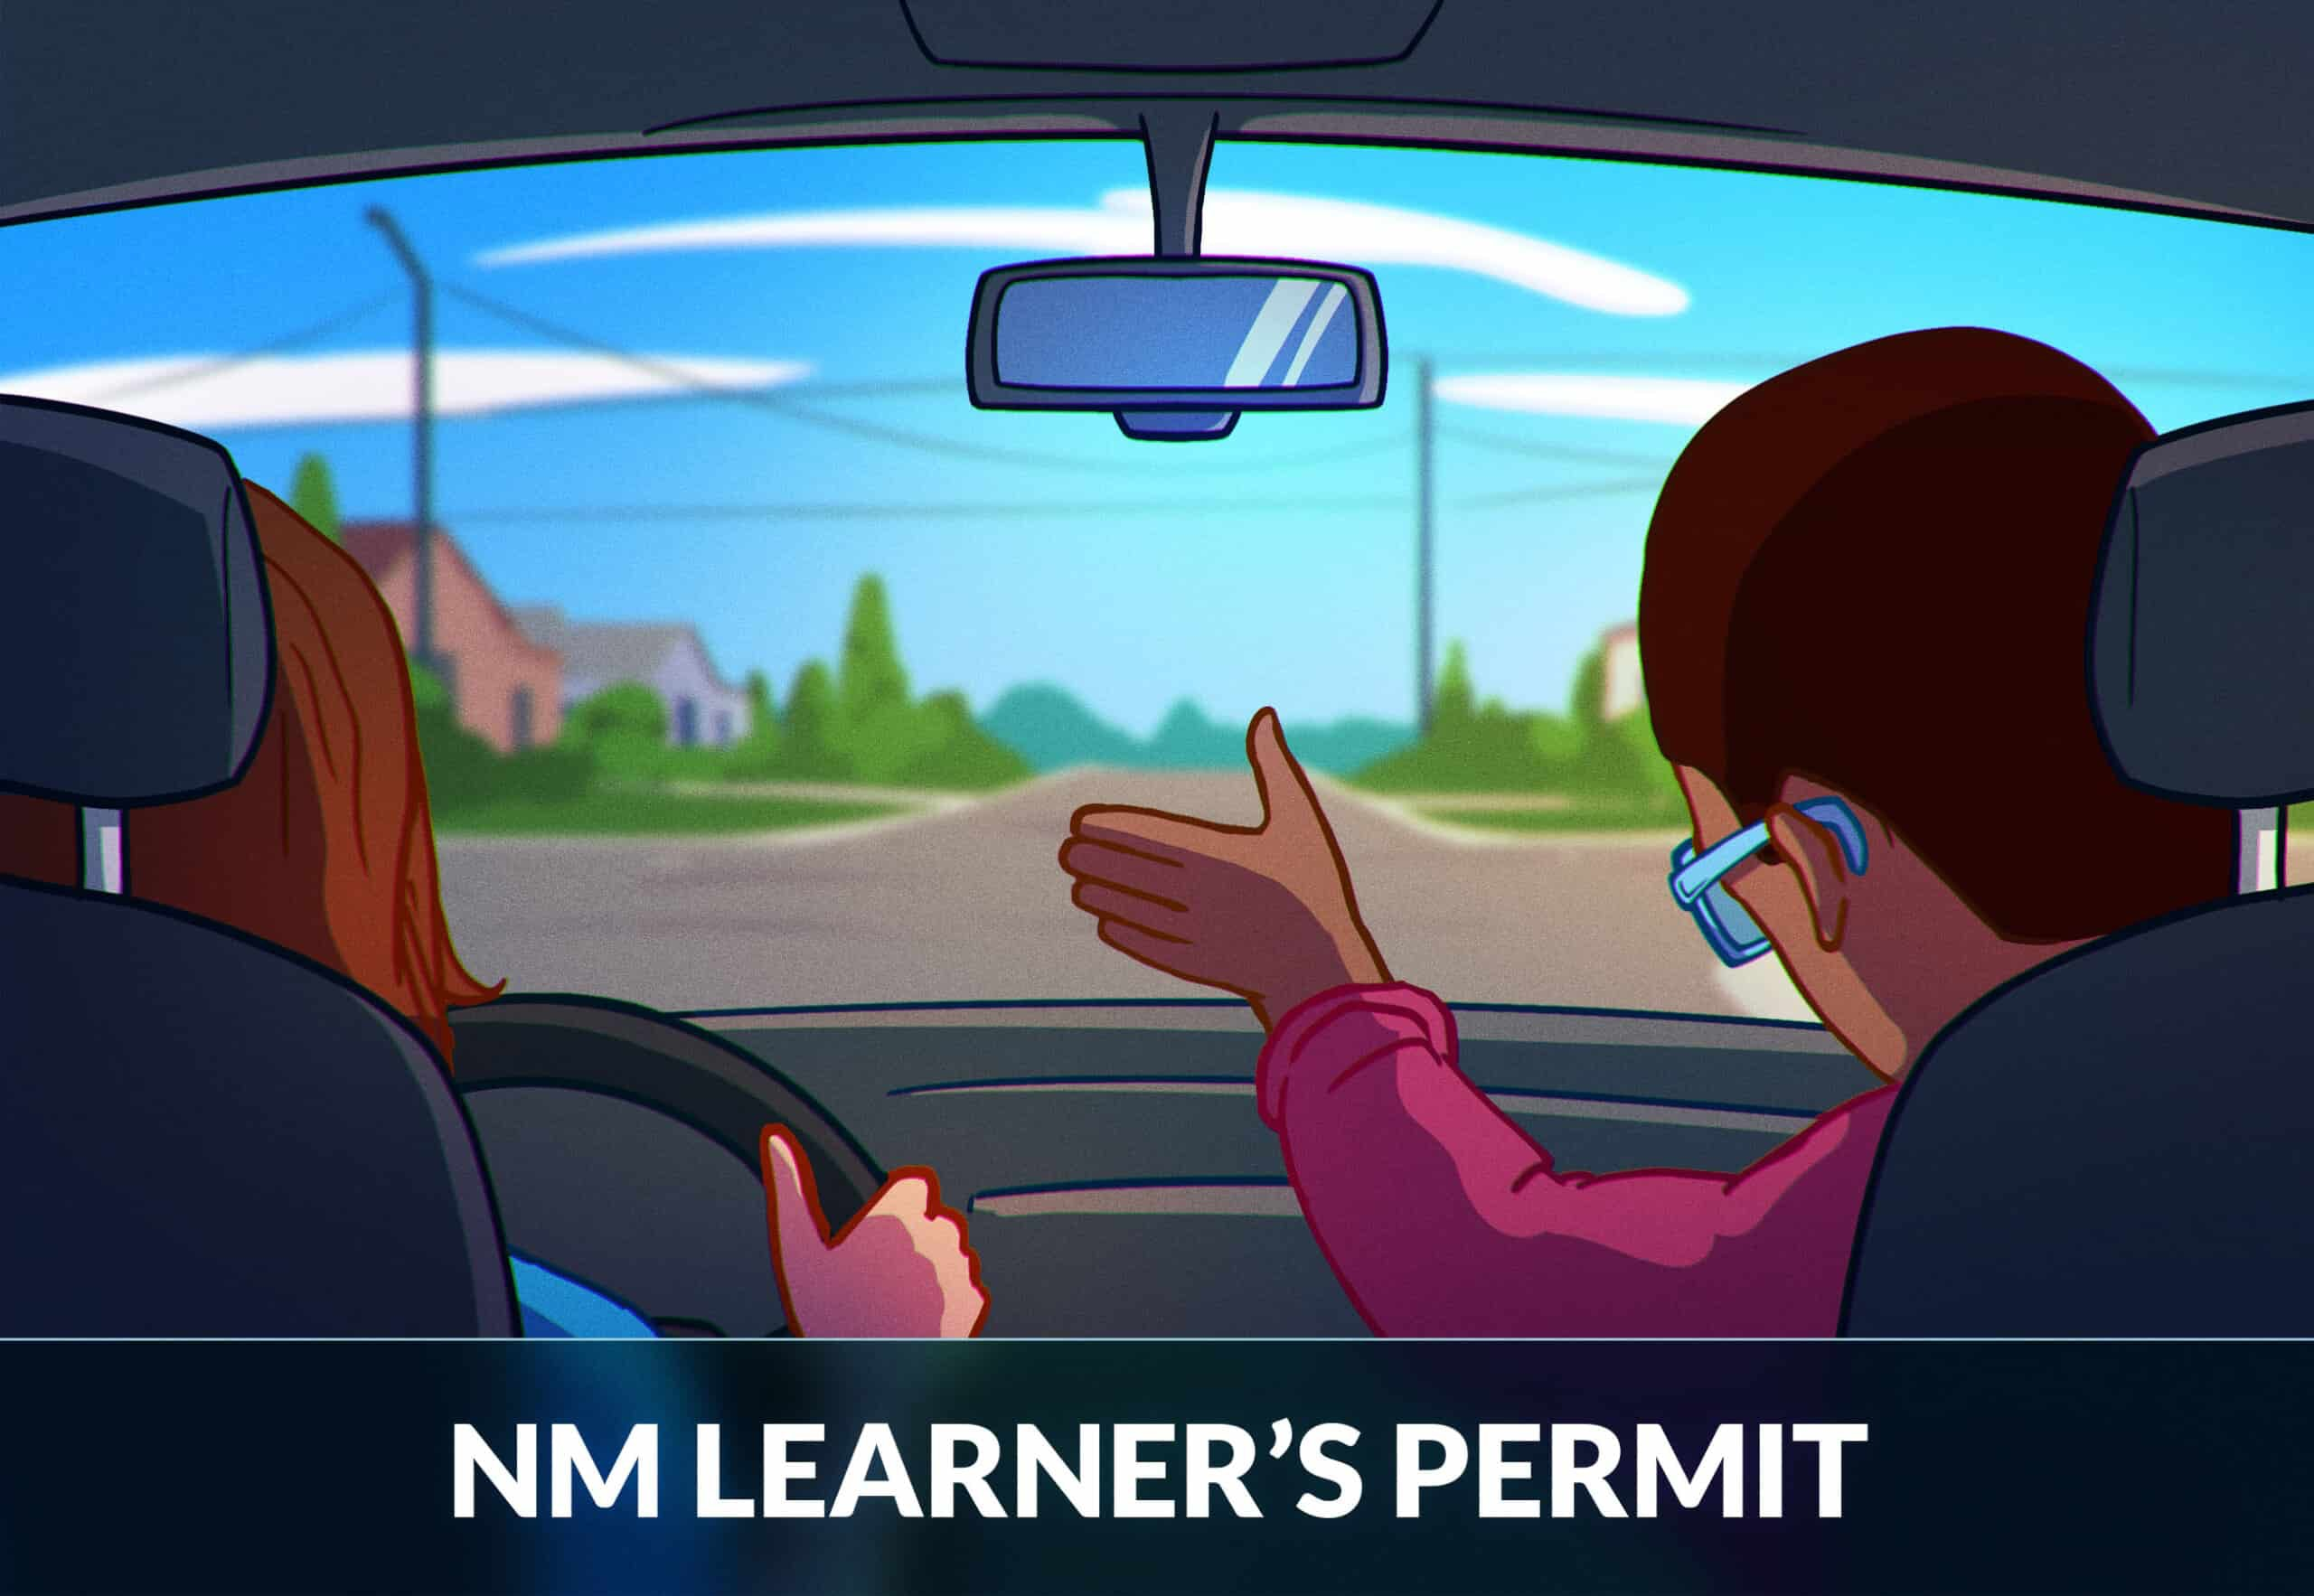 New Mexico (NM) Learner's Permit